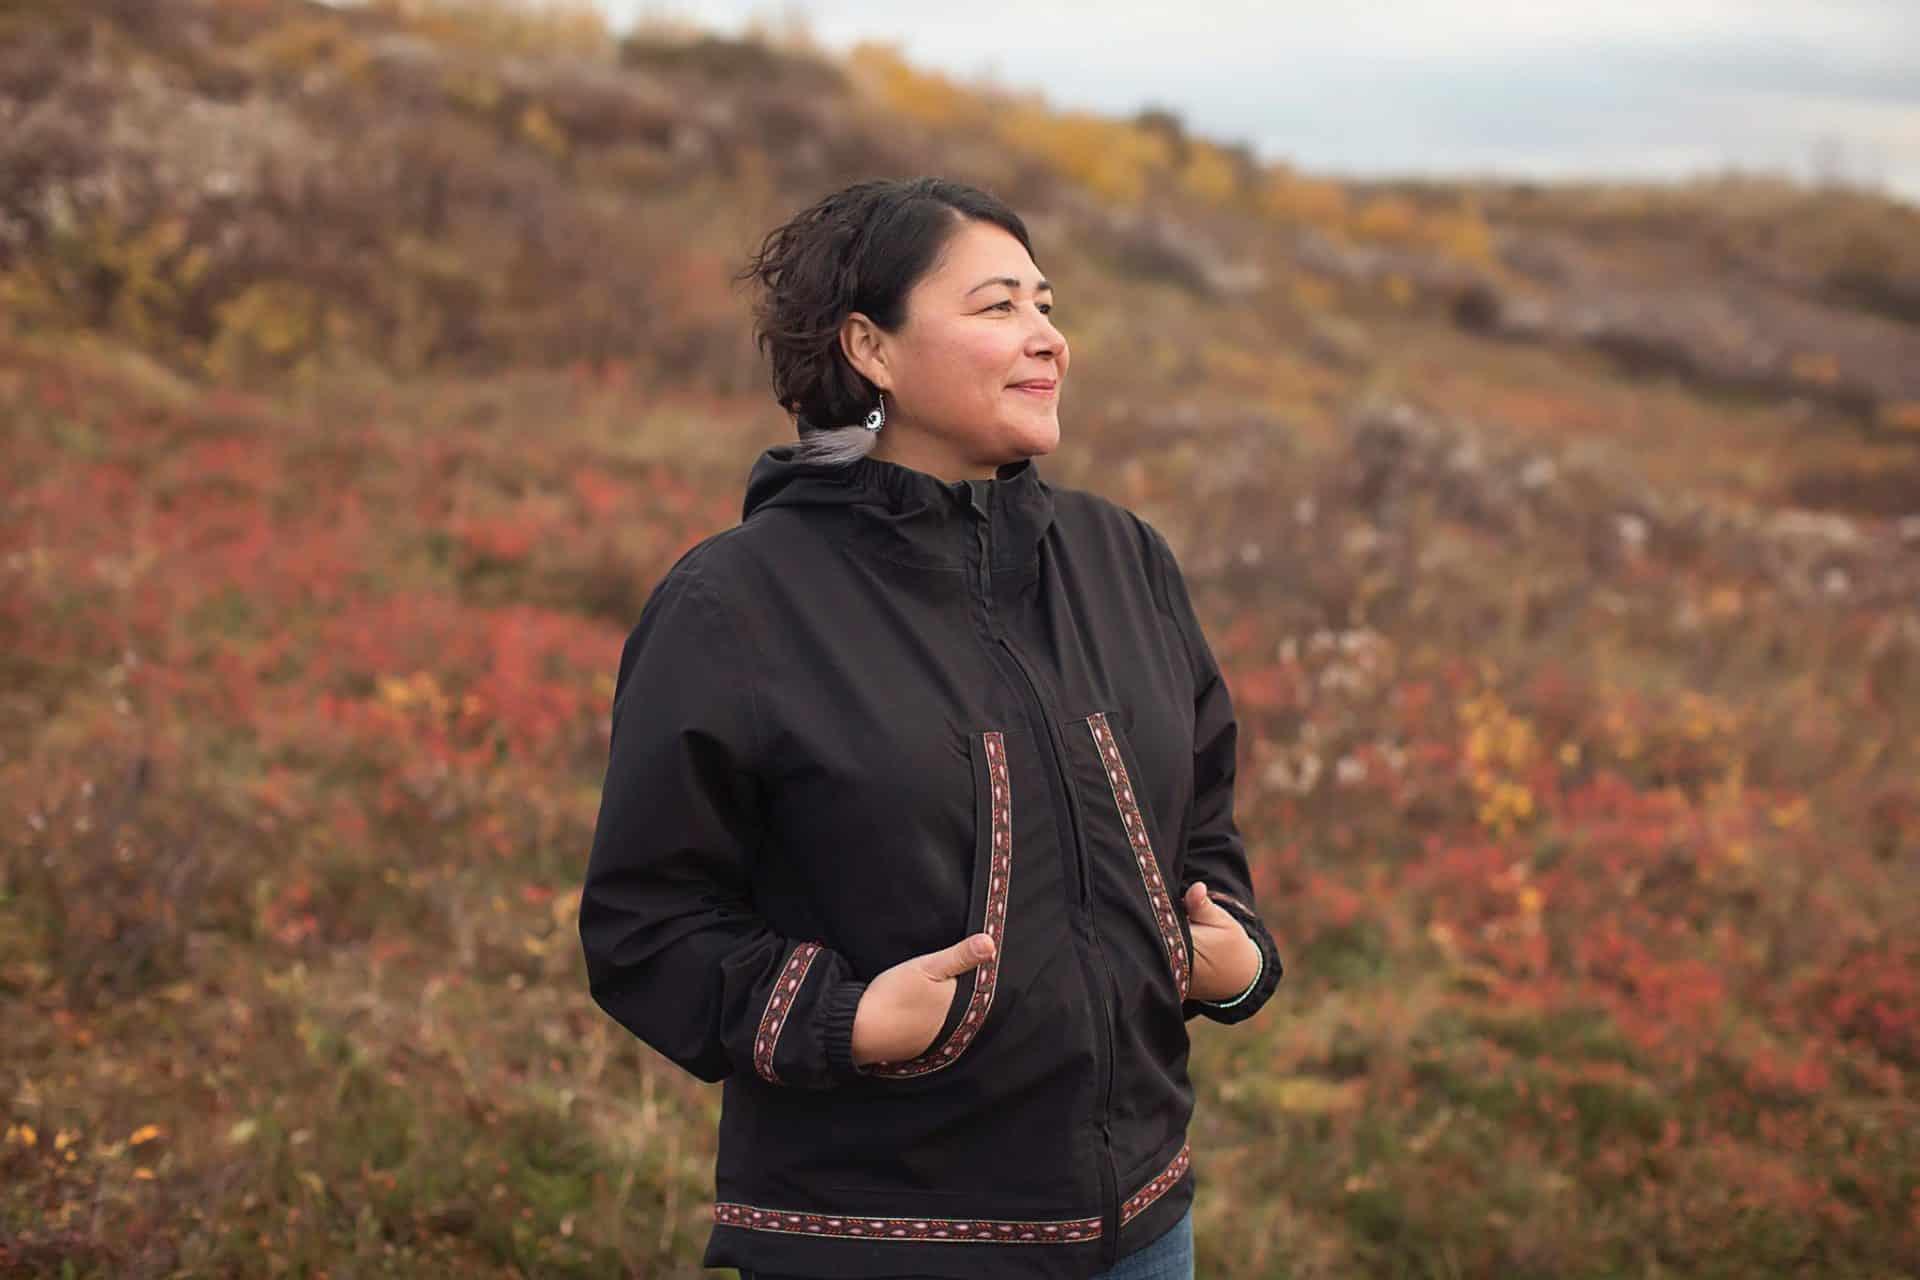 https://beringstraits.com/wp-content/uploads/2020/04/Arctic-Wear.jpg